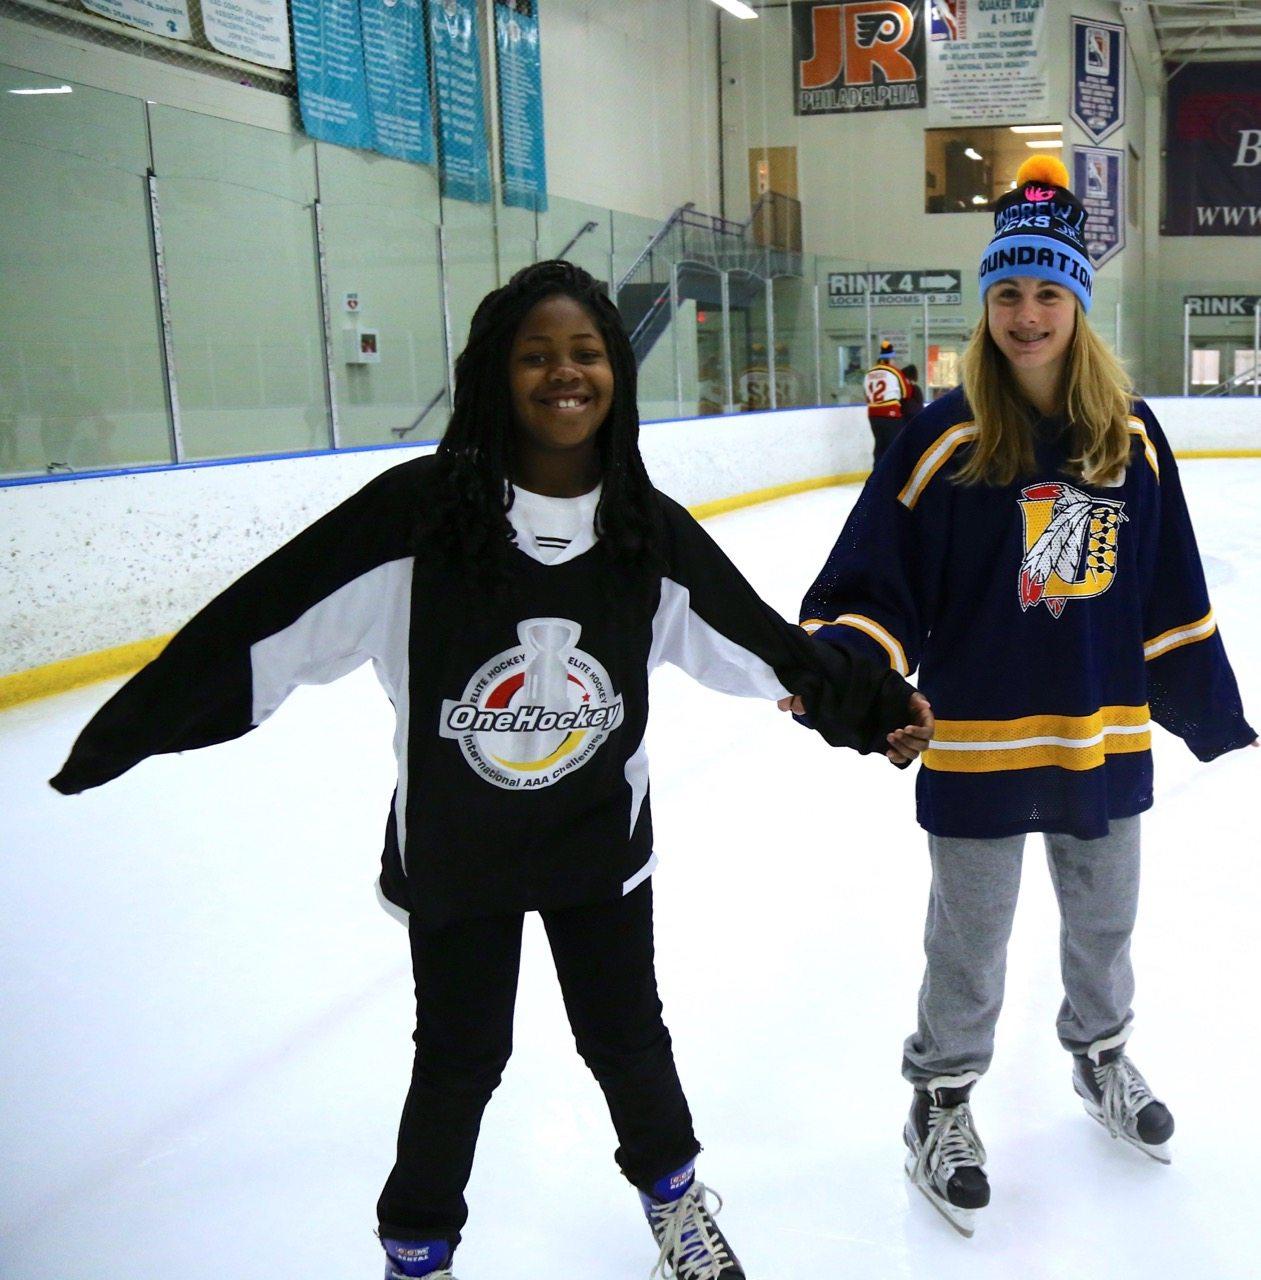 One Hockey